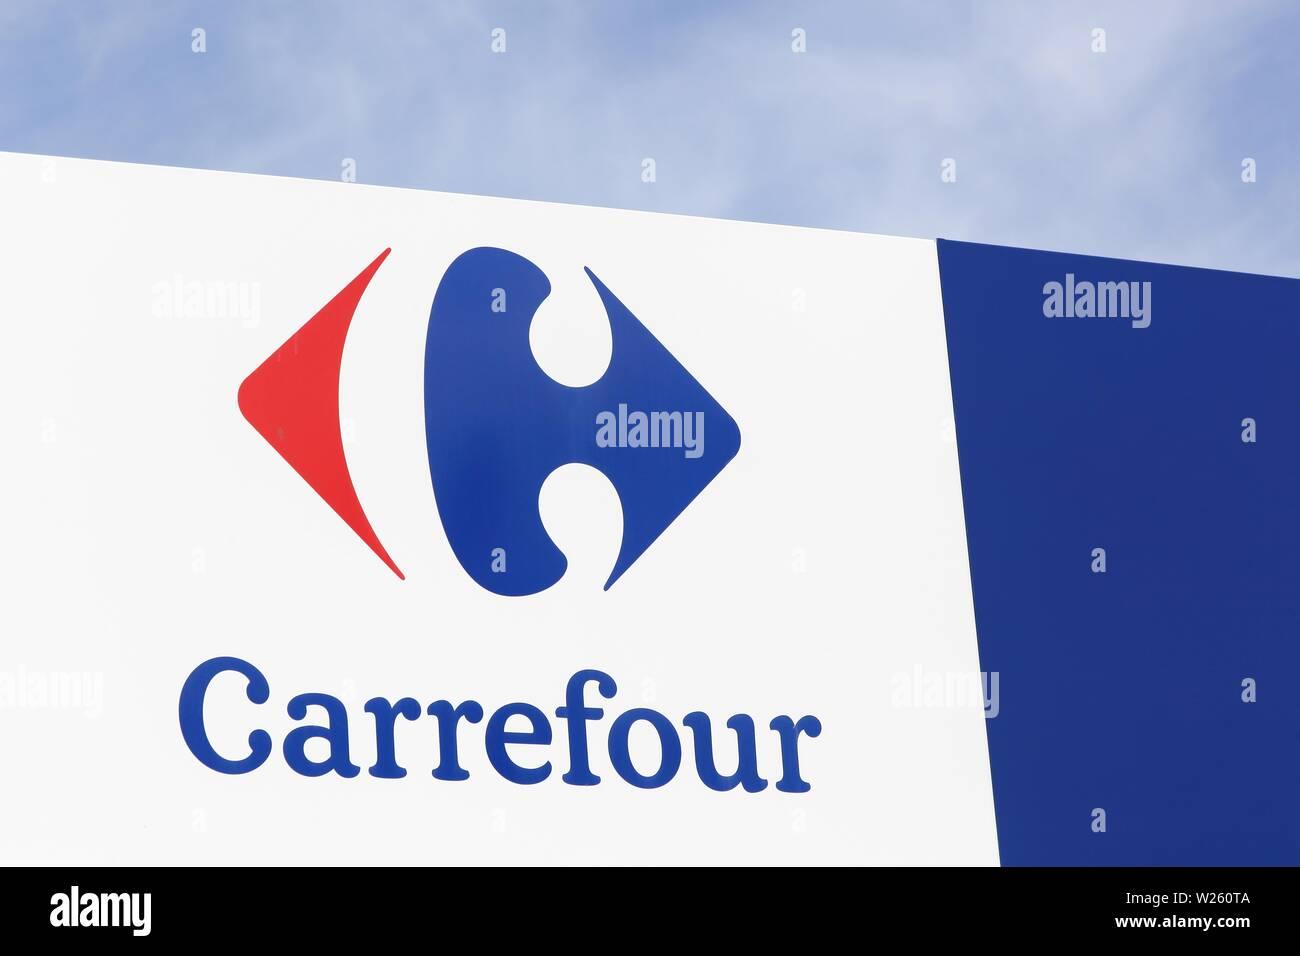 Carrefour France Europe Stock Photos & Carrefour France Europe Stock